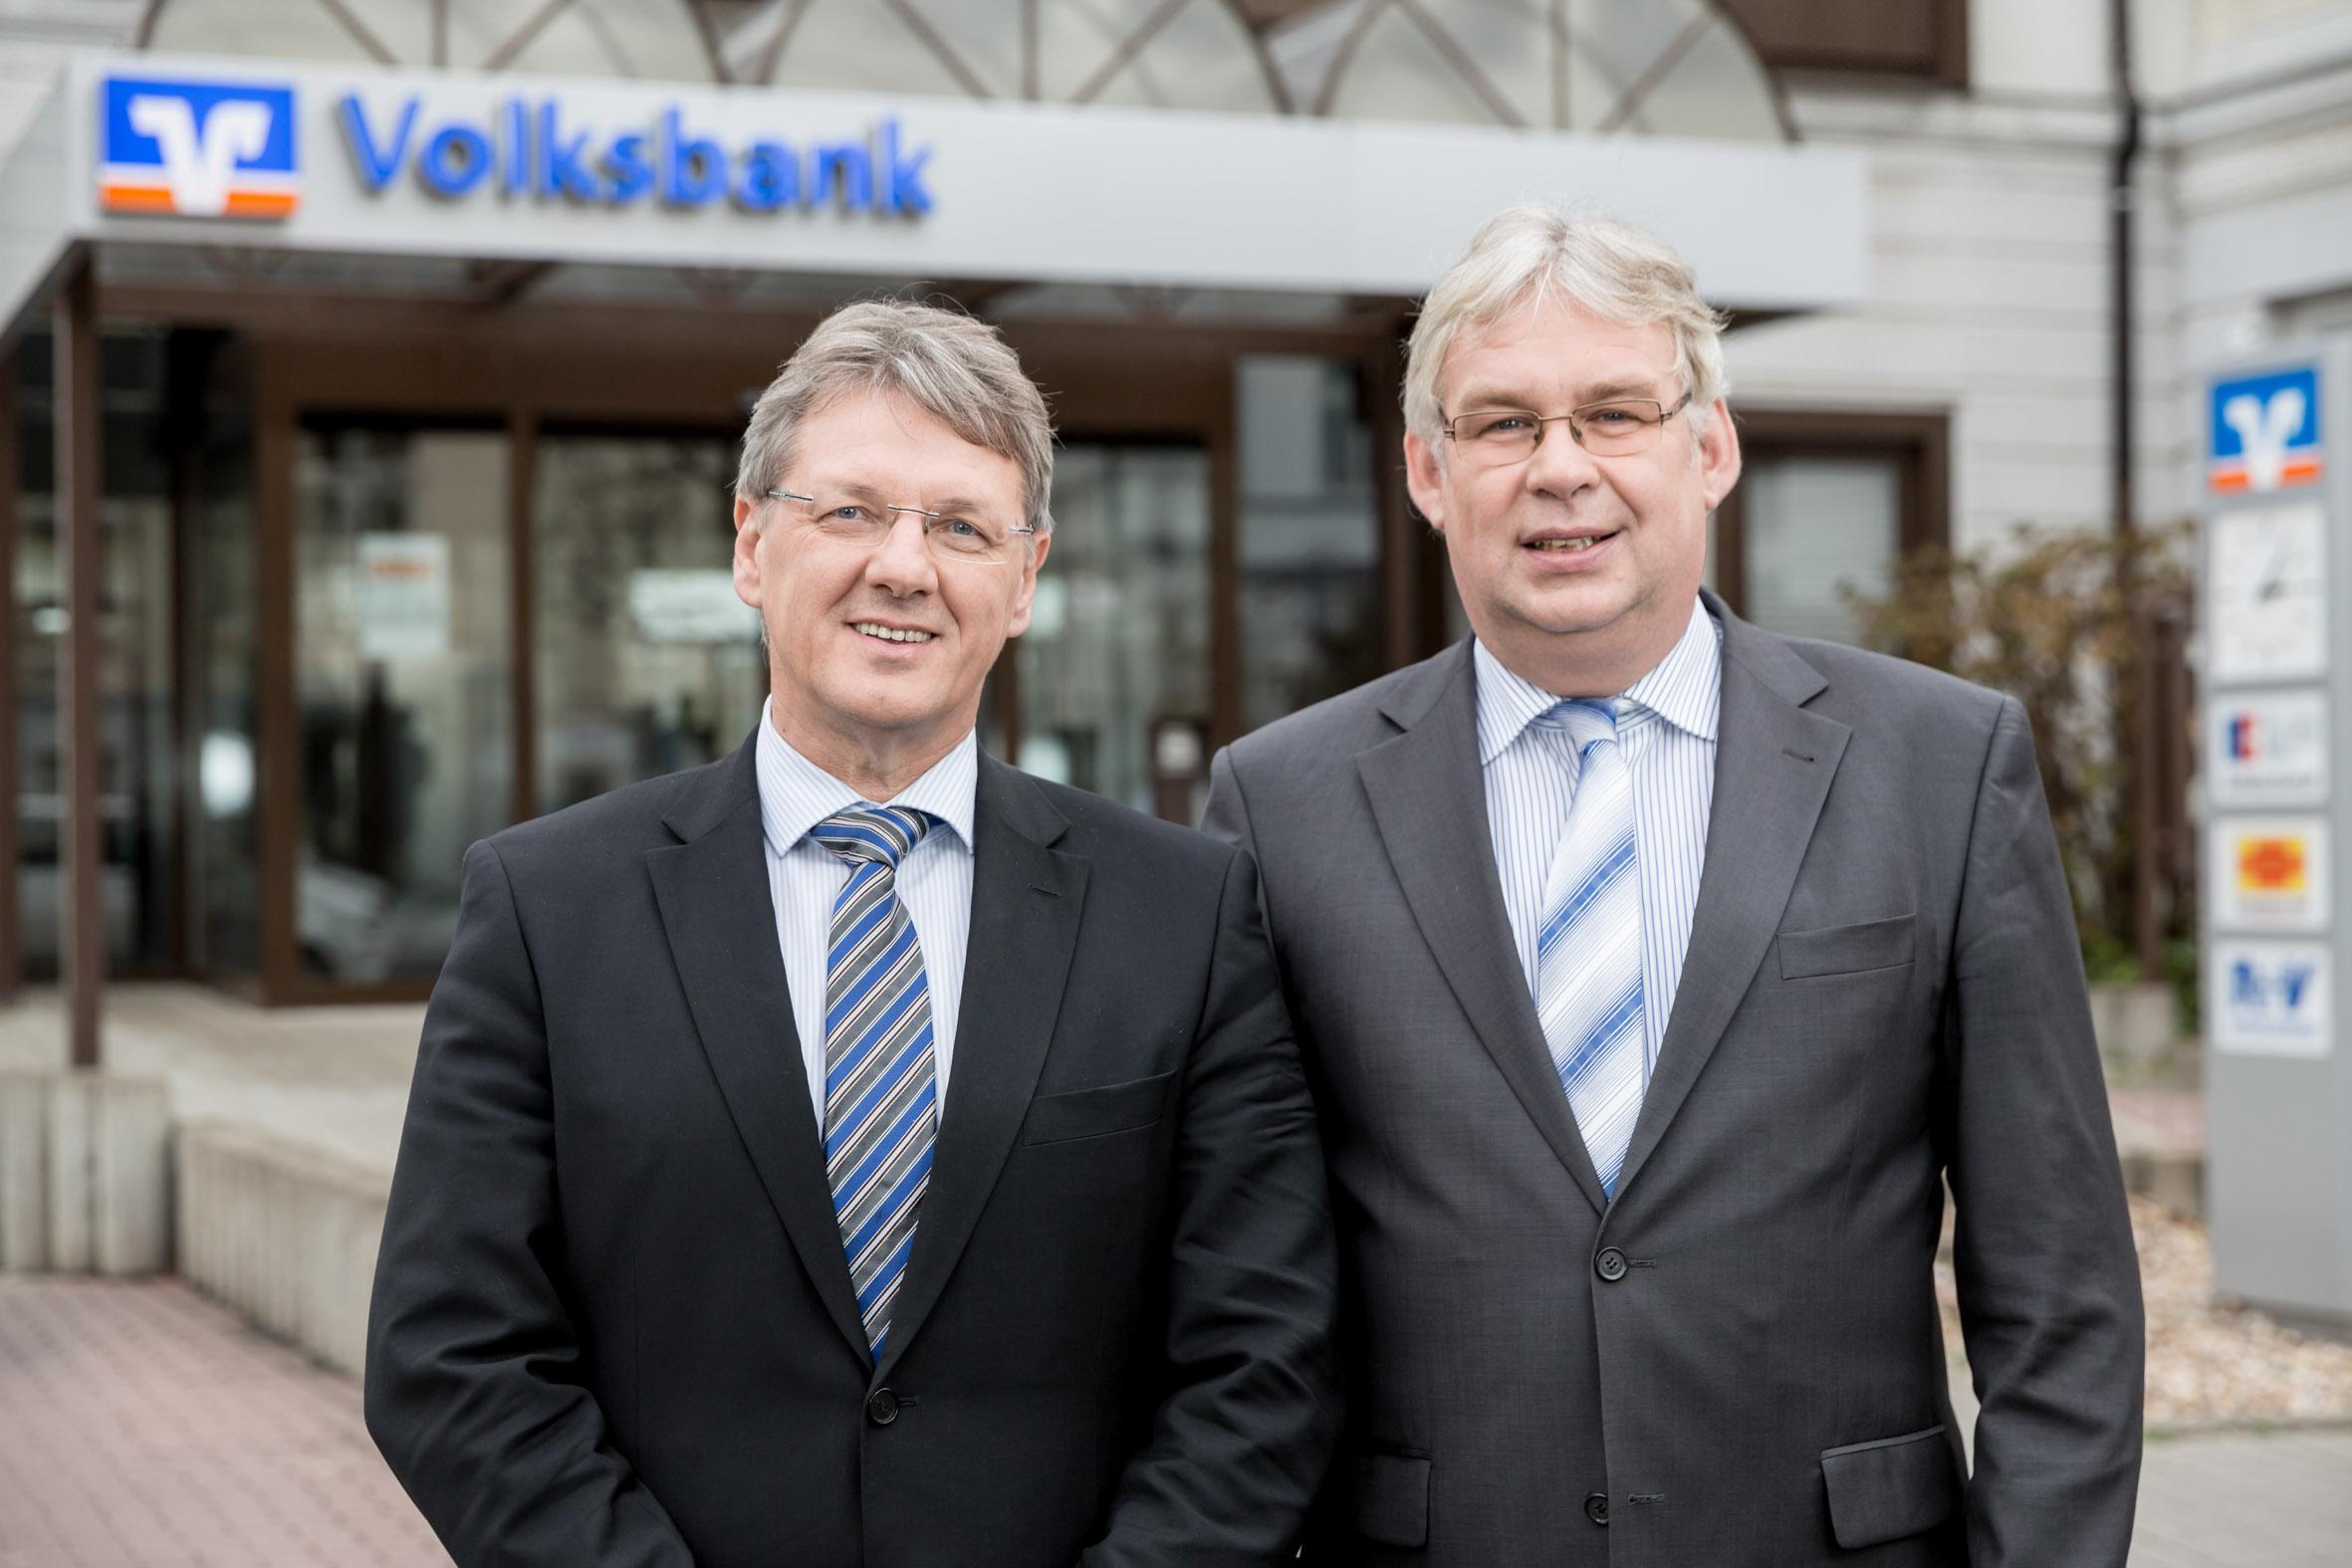 Organe Gremien - Volksbank Börde-Bernburg eG